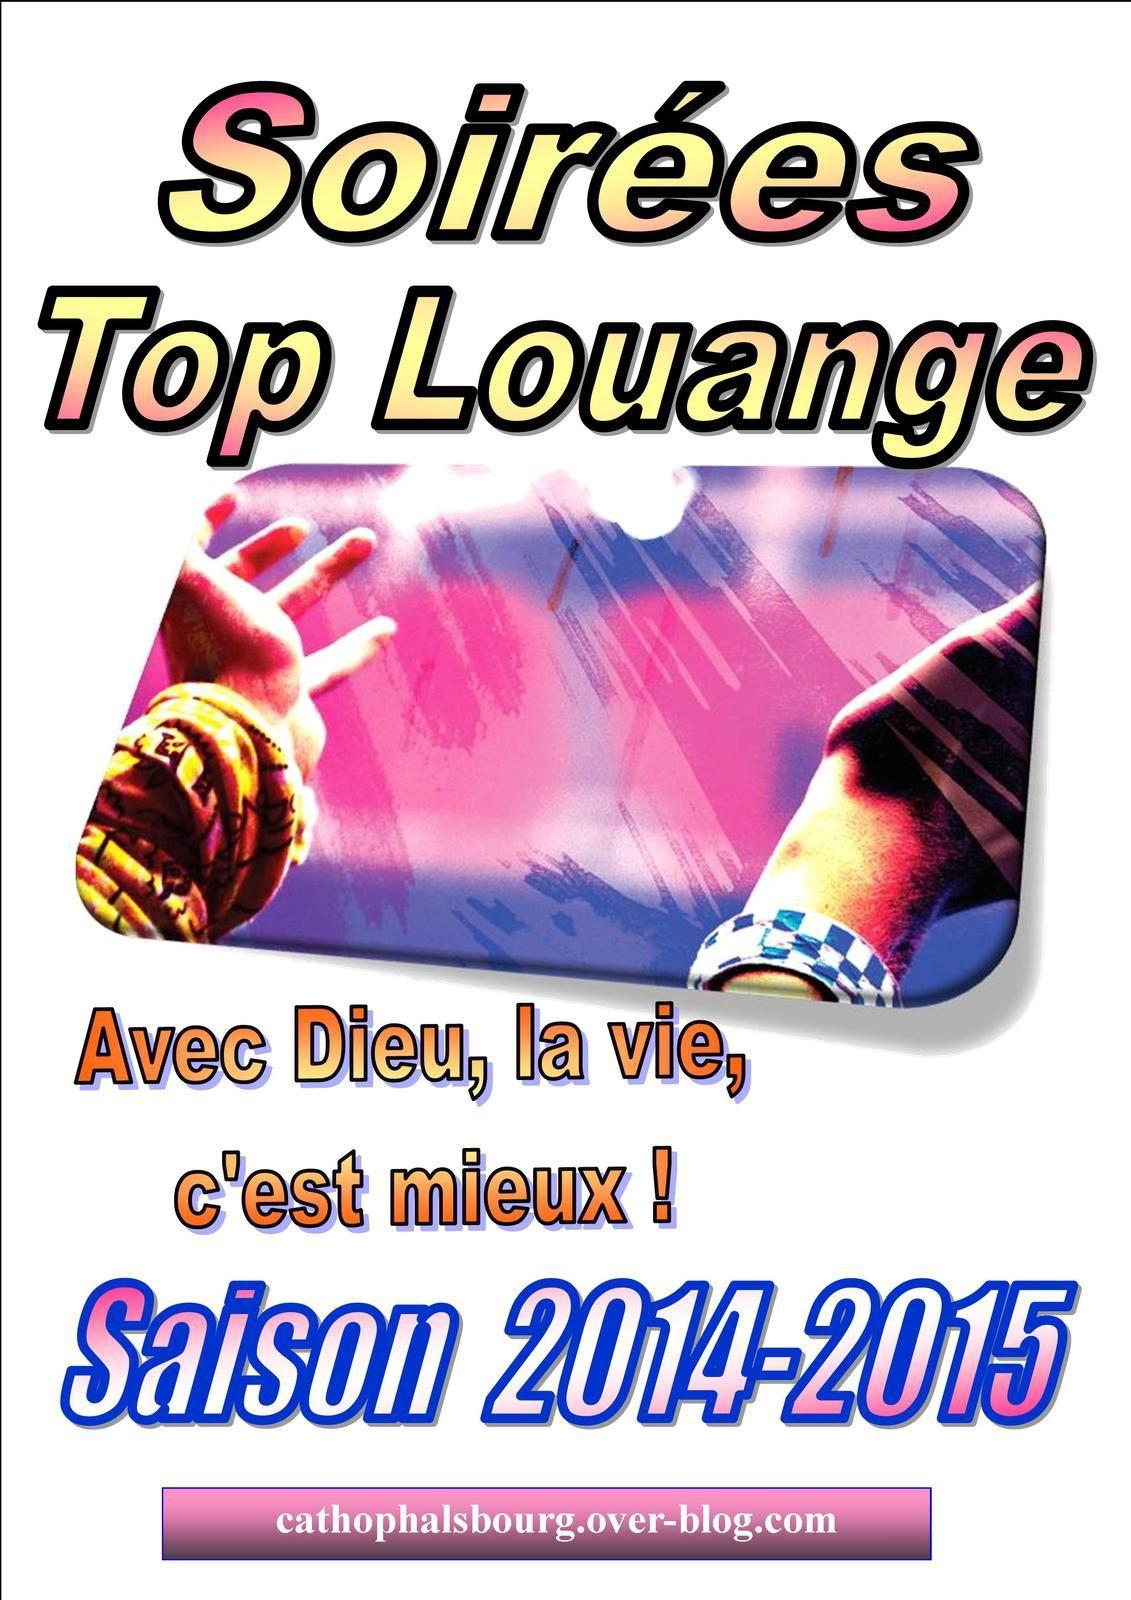 SOIREE TOP LOUANGE vendredi 10 octobre